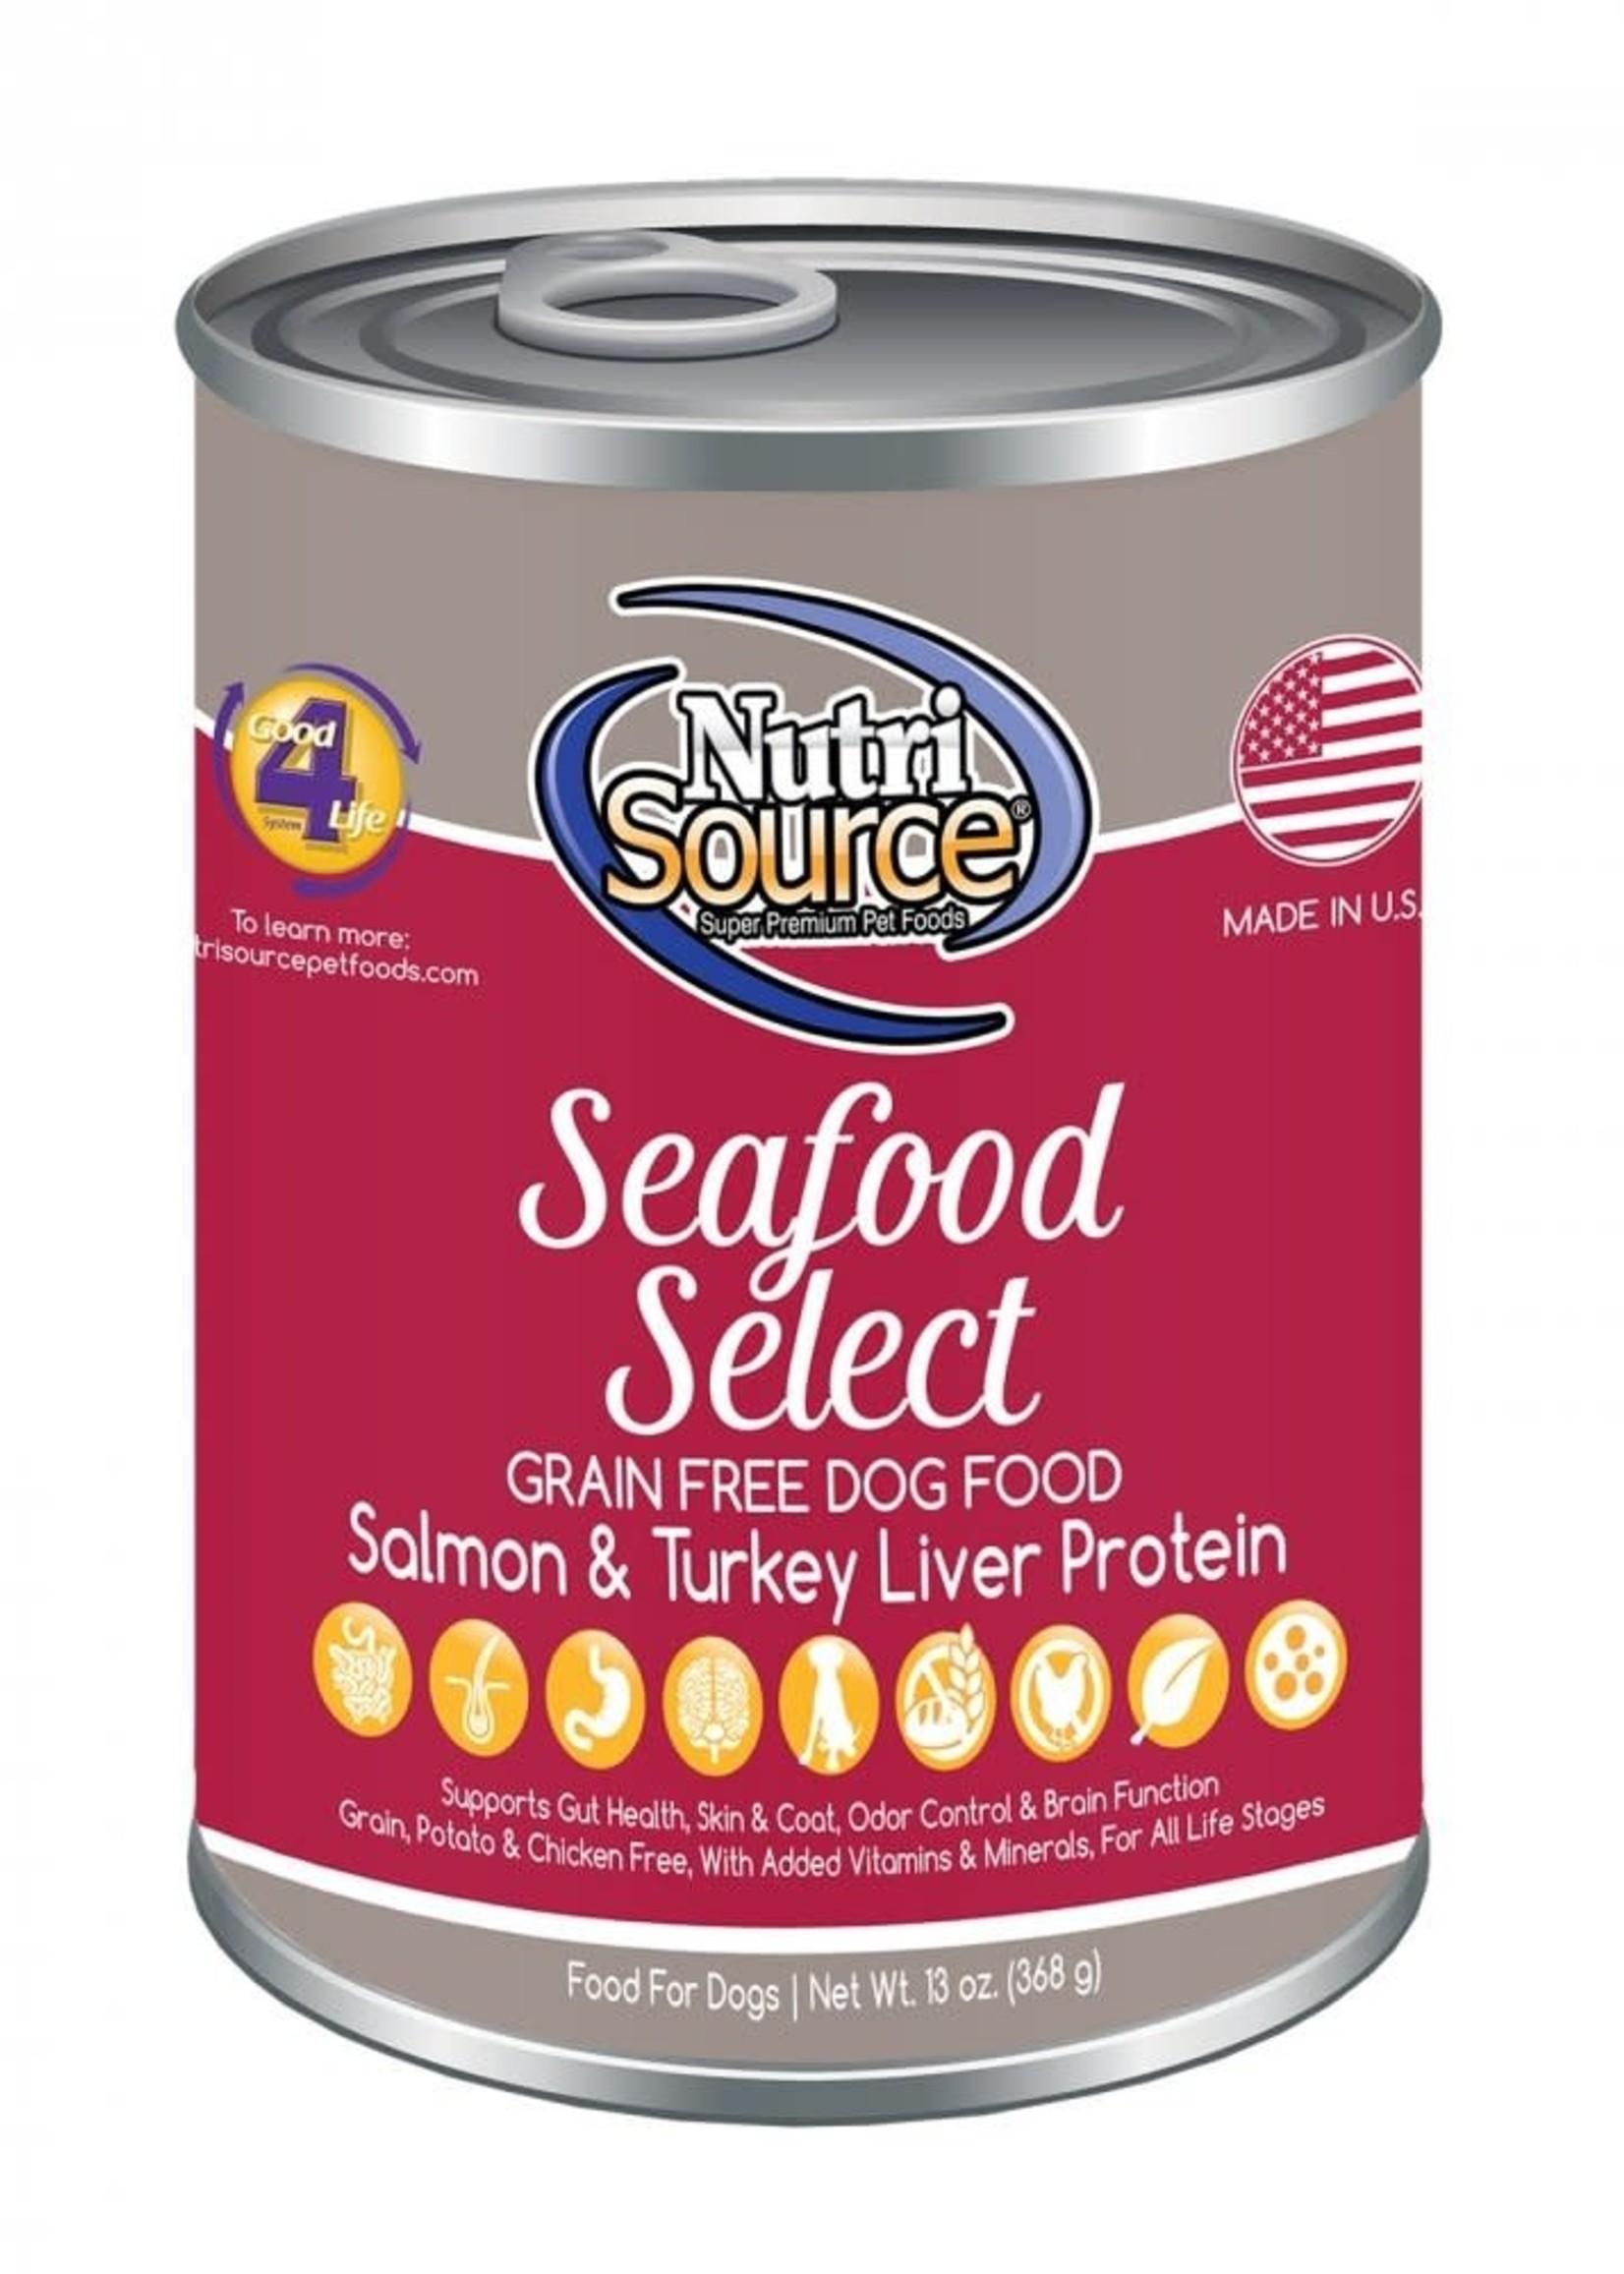 Nutrisource Nutrisource Grain-Free Seafood Select Wet Dog Food 13oz